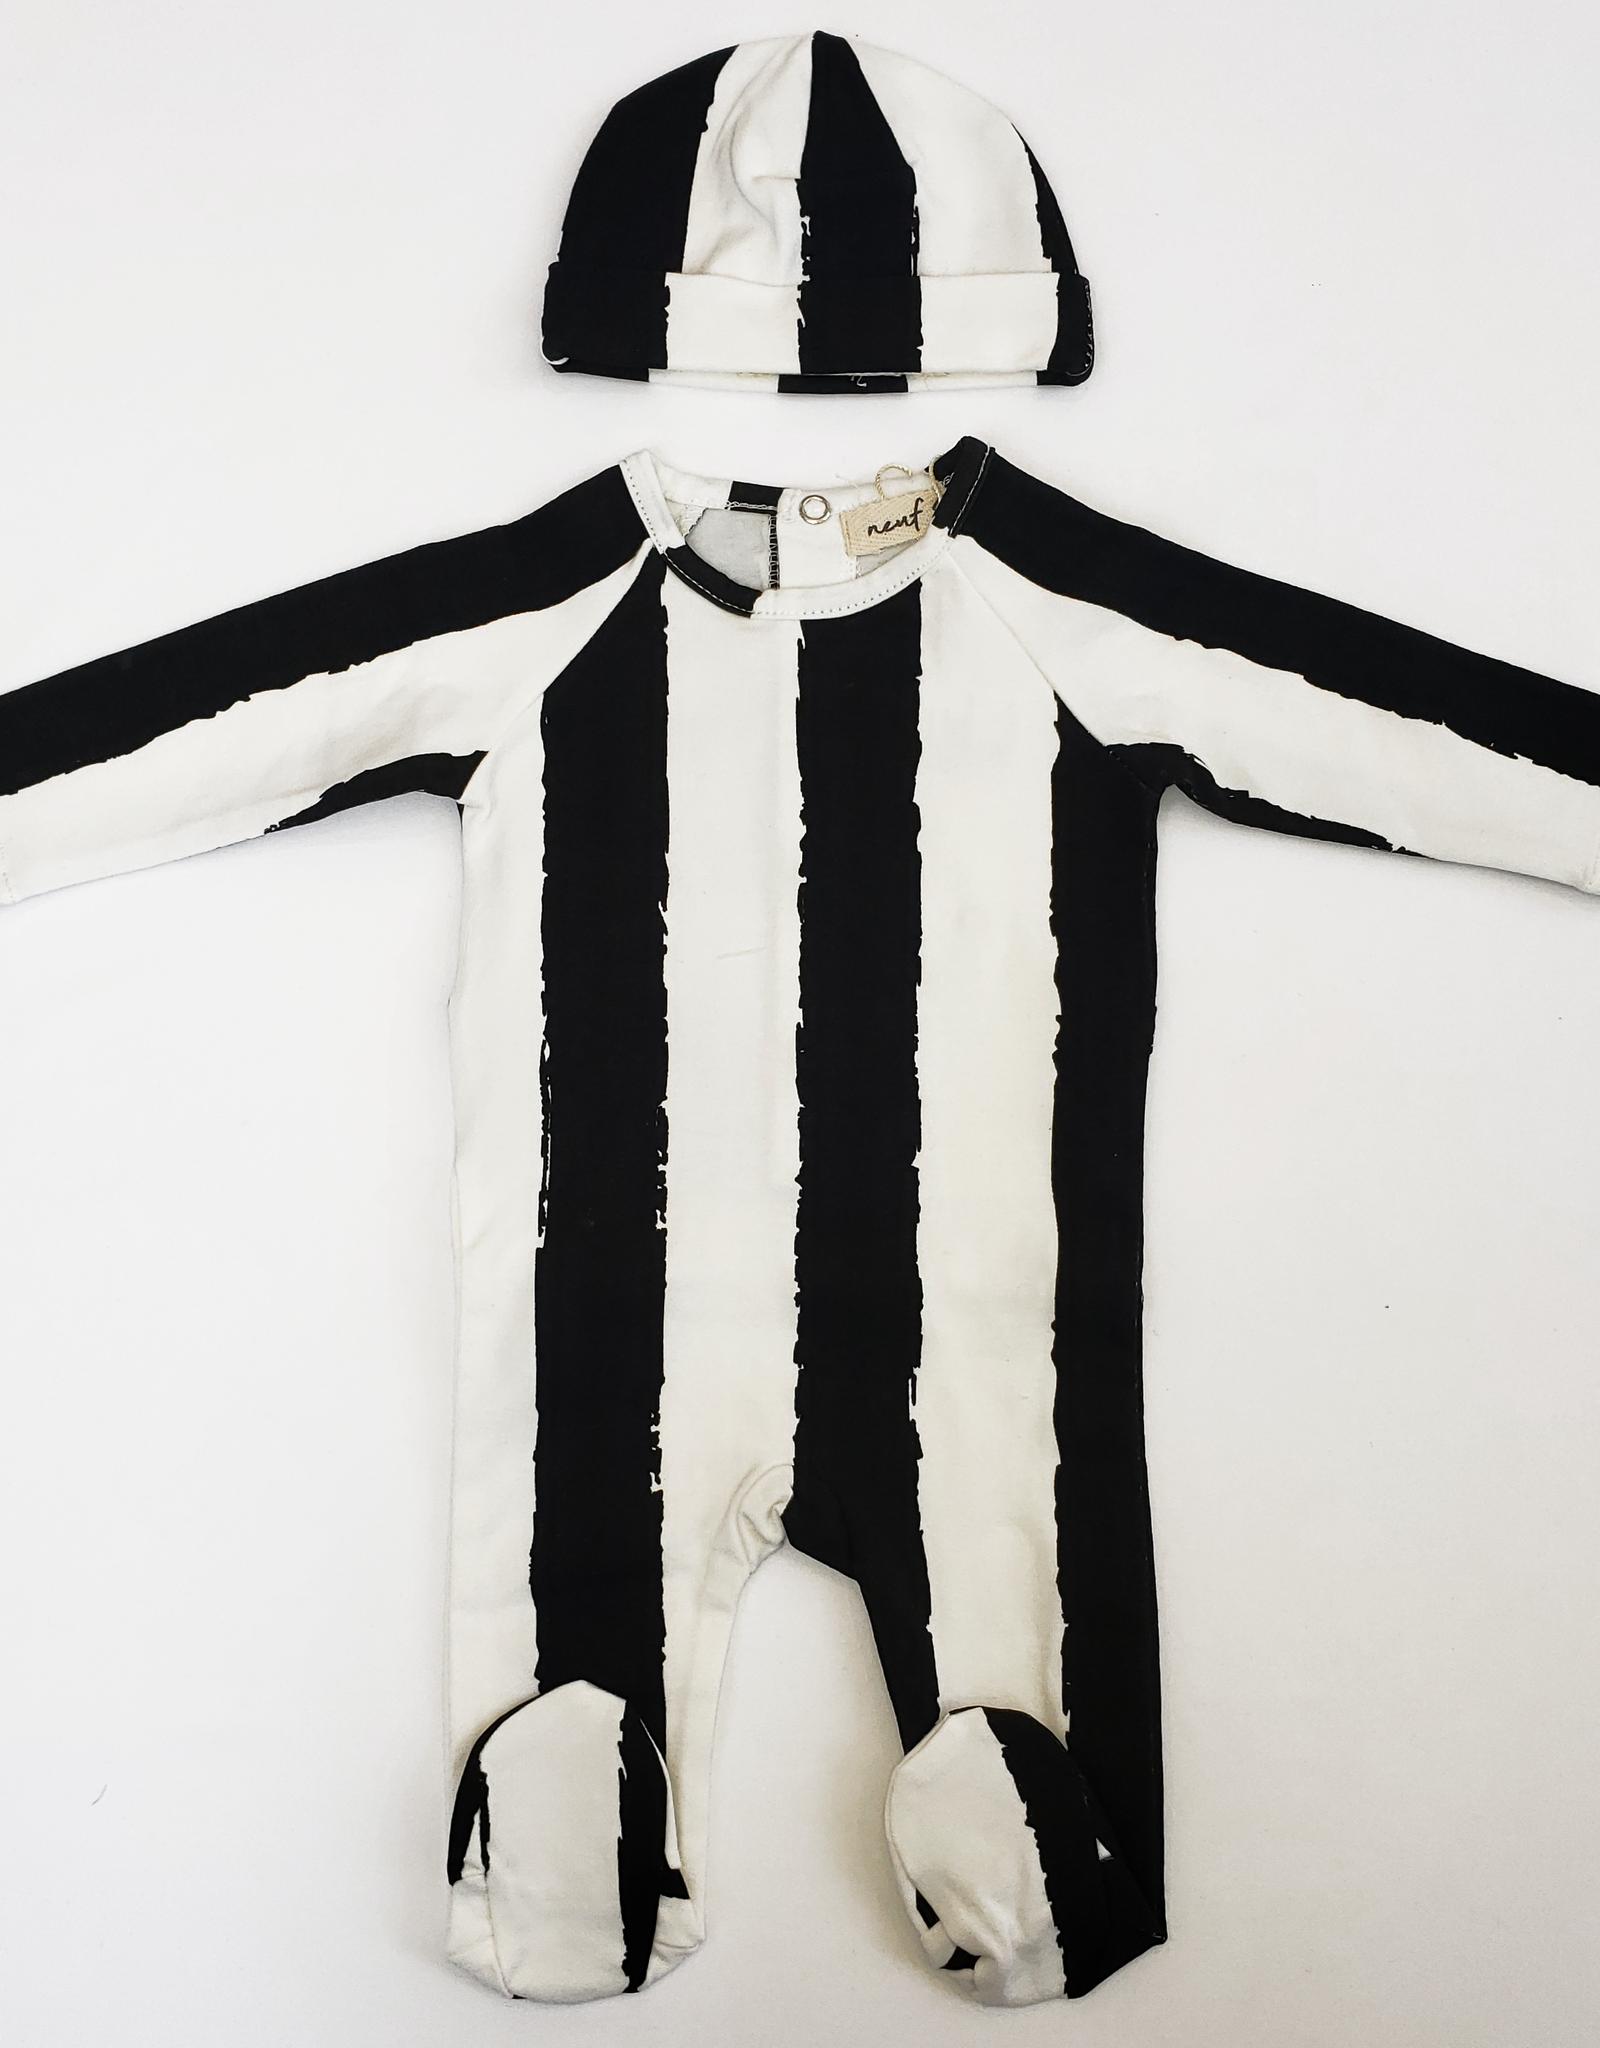 Neuf 9 Neuf 9 Vertical Stripe Footie with Hat